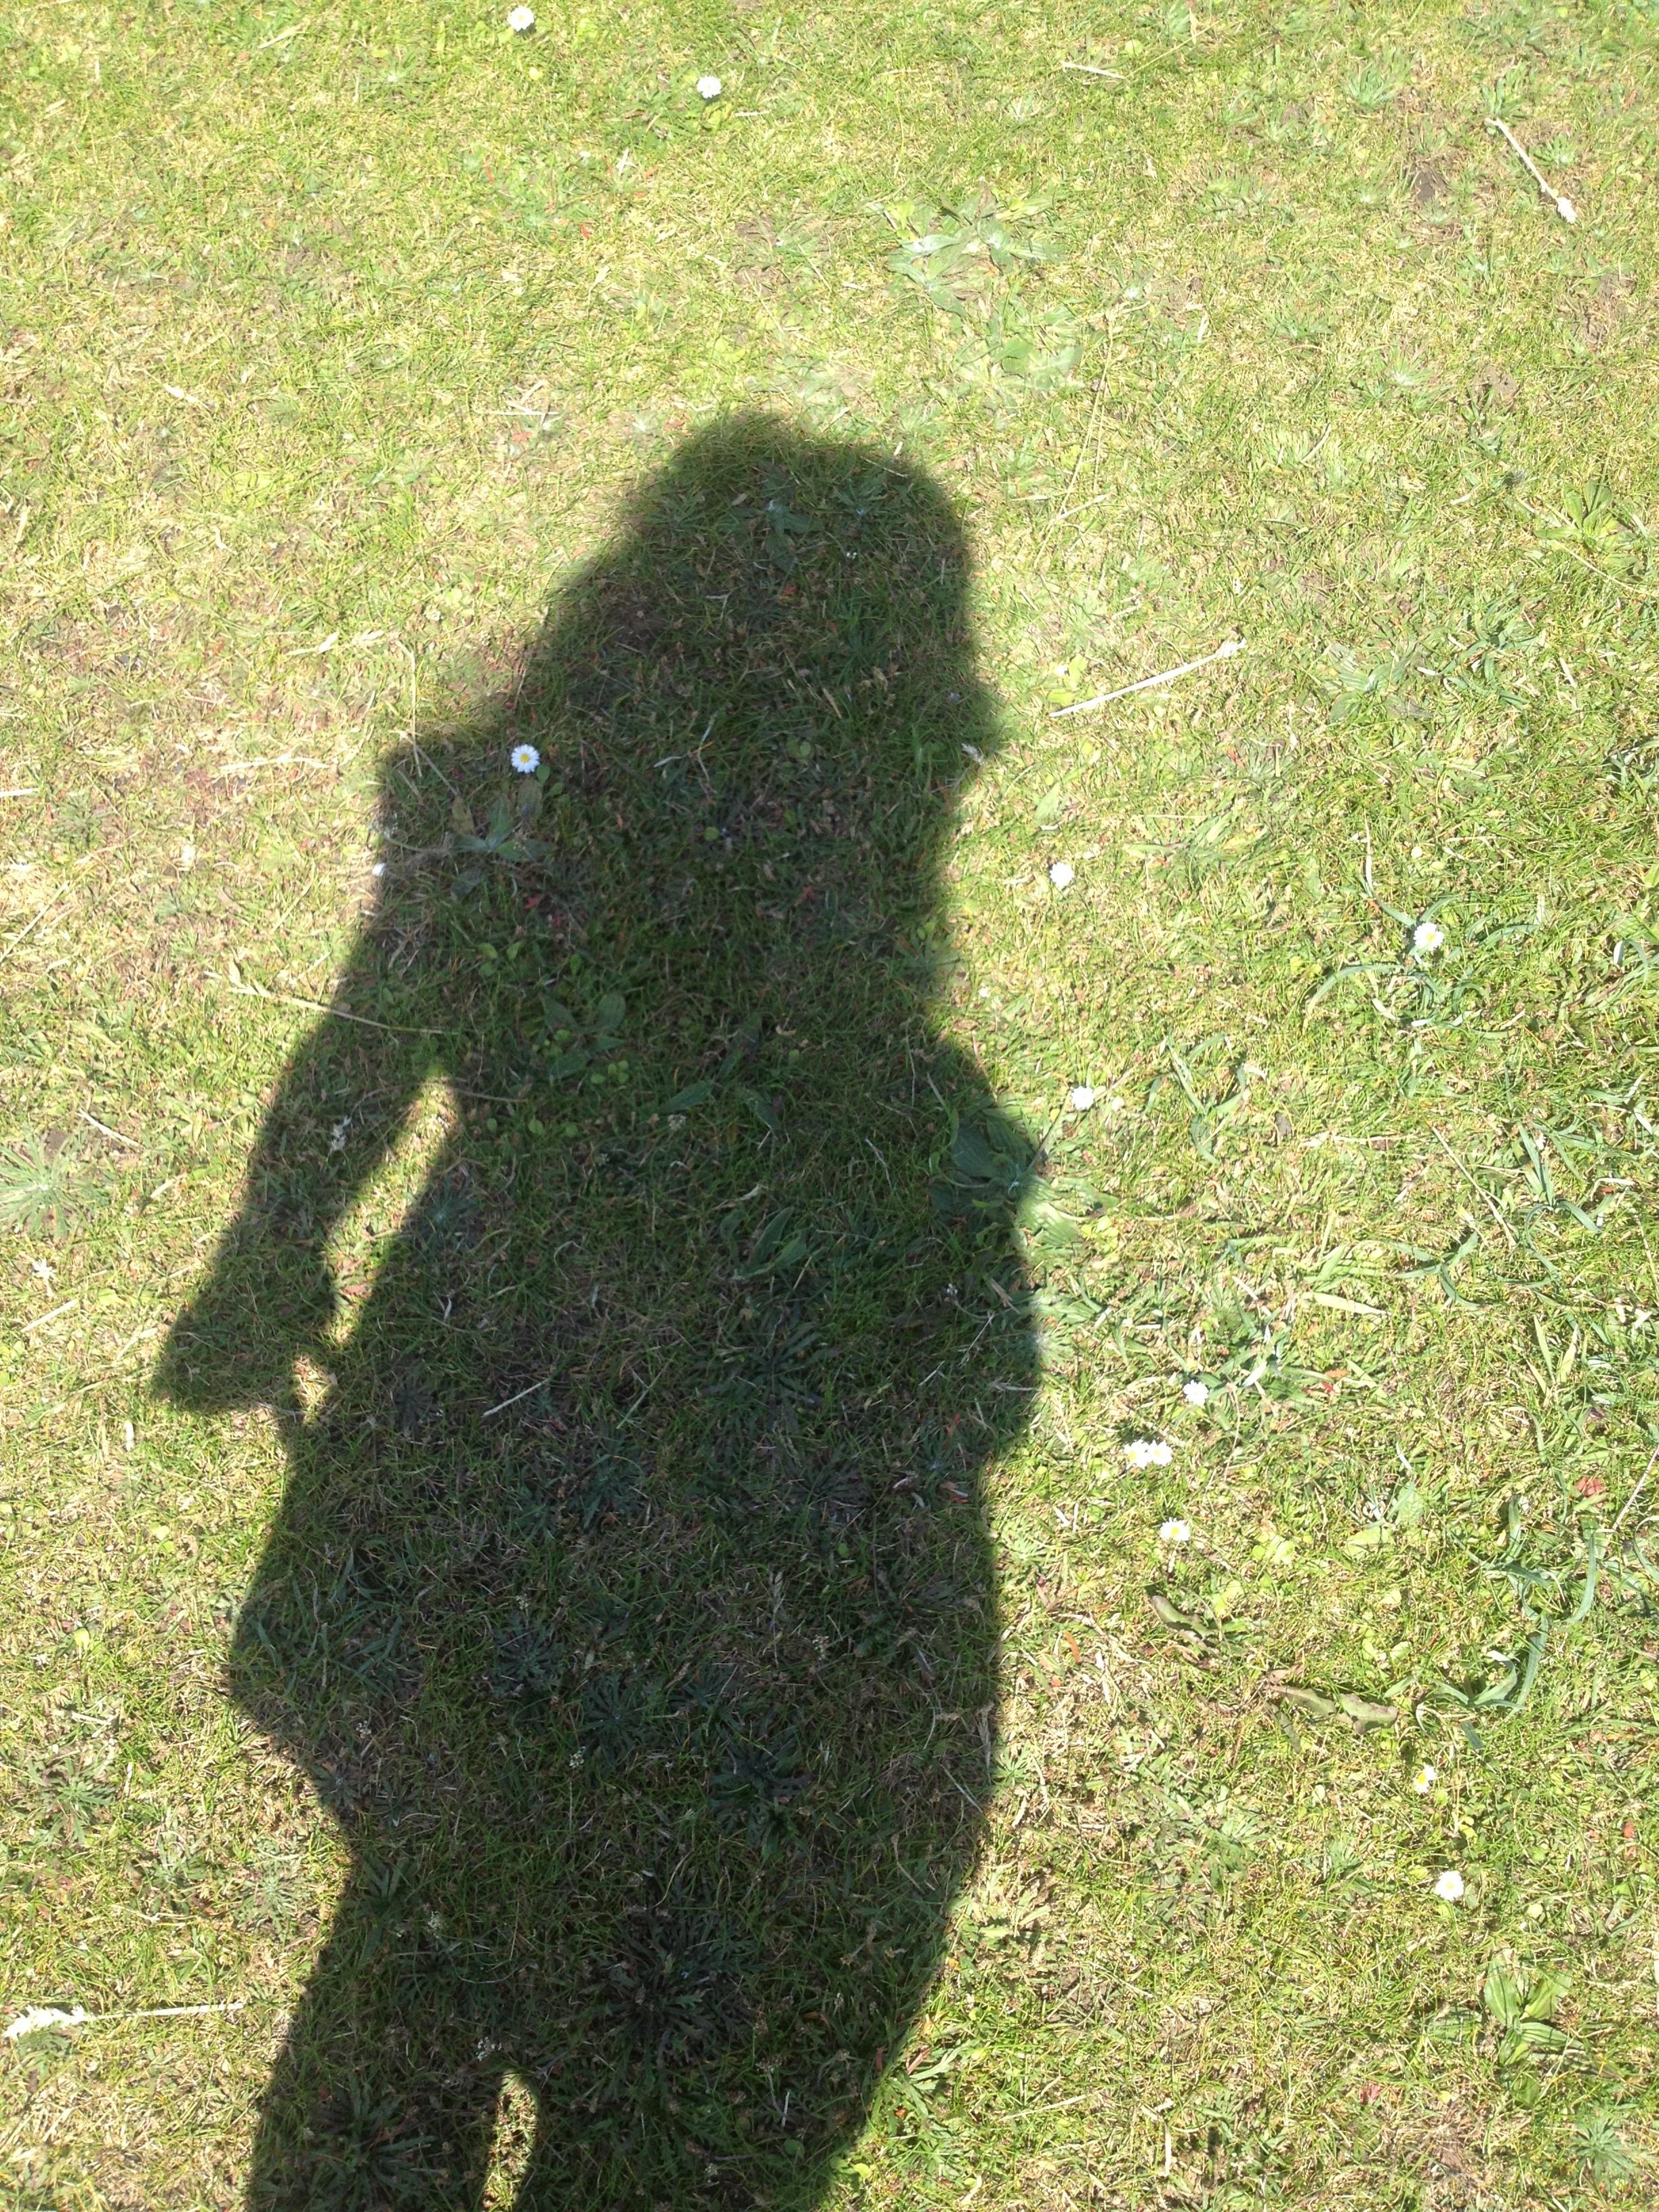 2013-07-08-shadow2.jpg